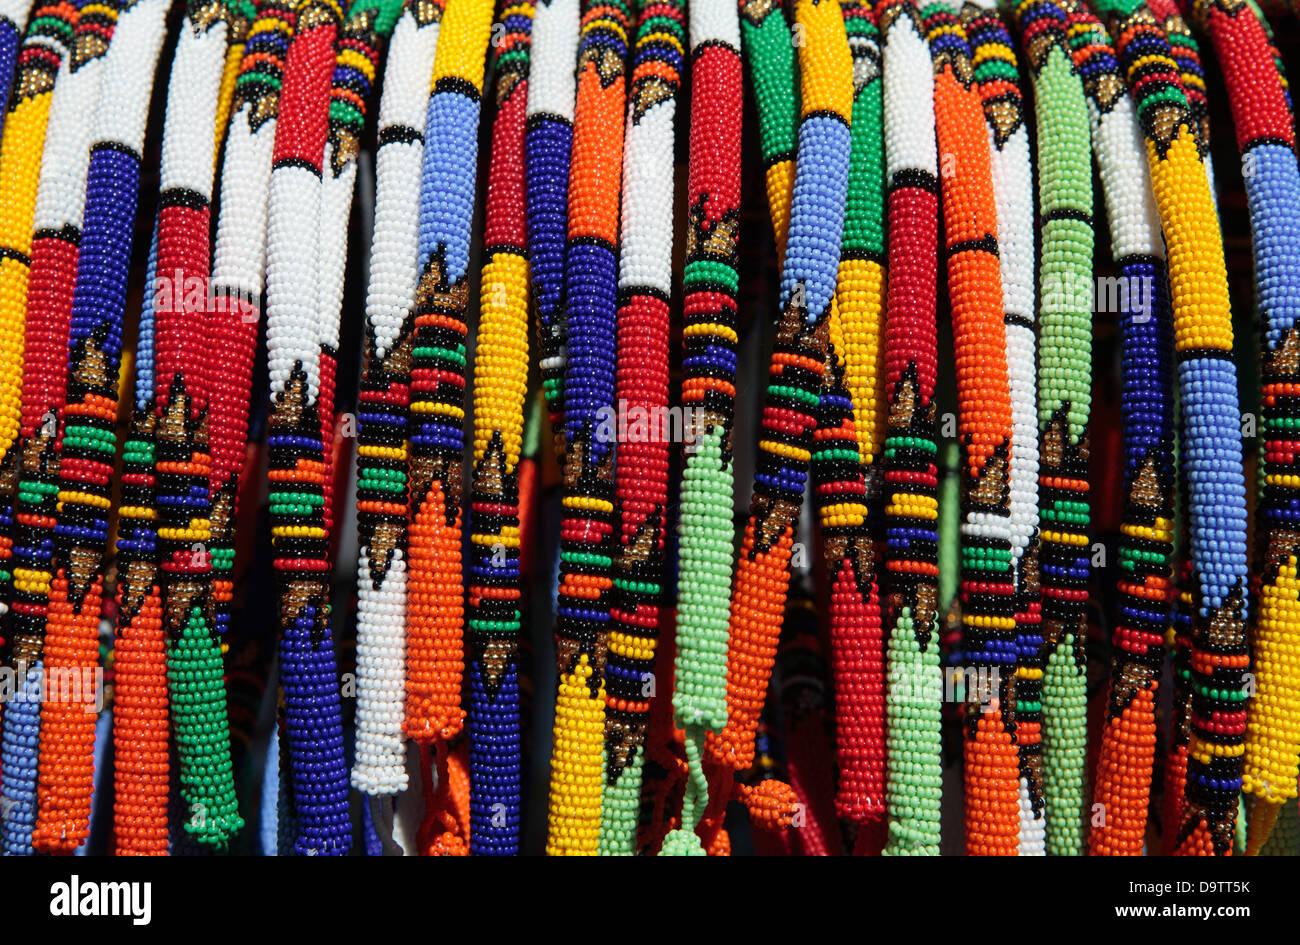 Xhosa Art And Craft